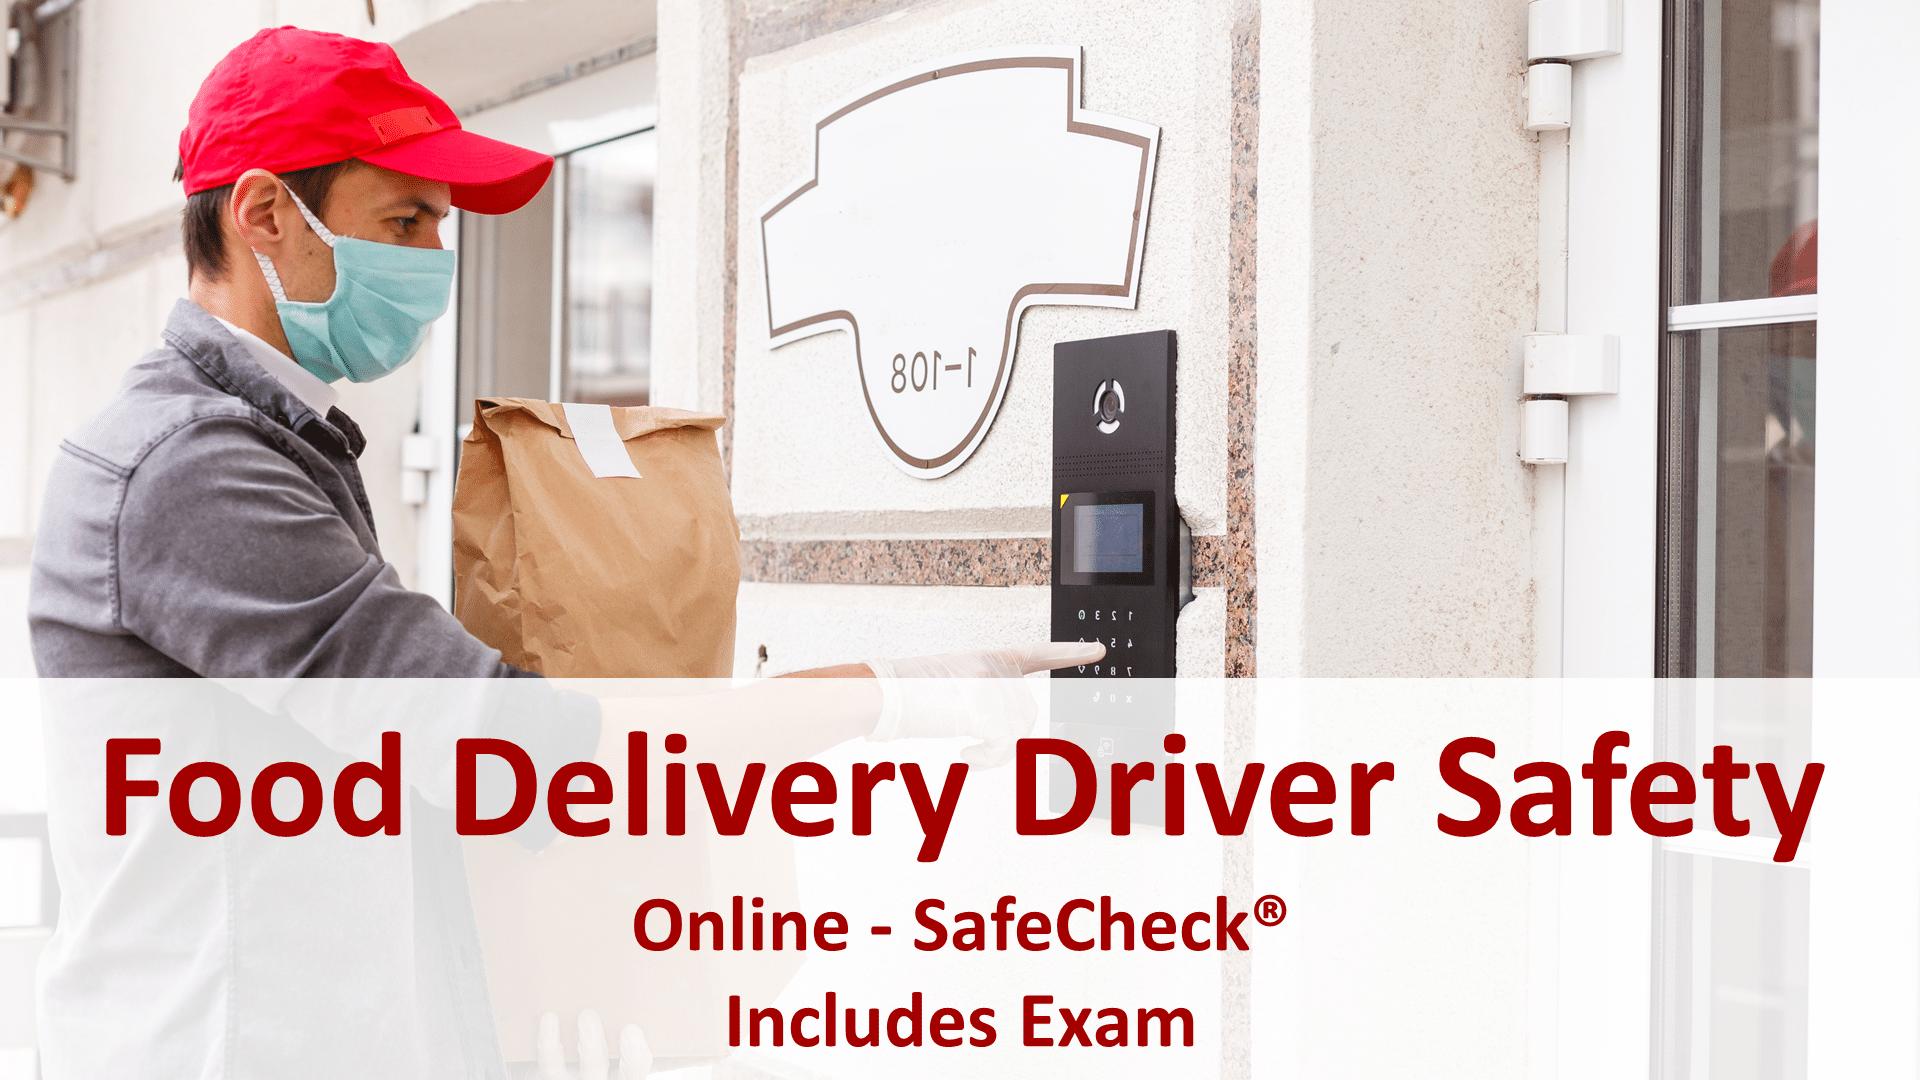 SafeCheck Food Delivery Driver Safety